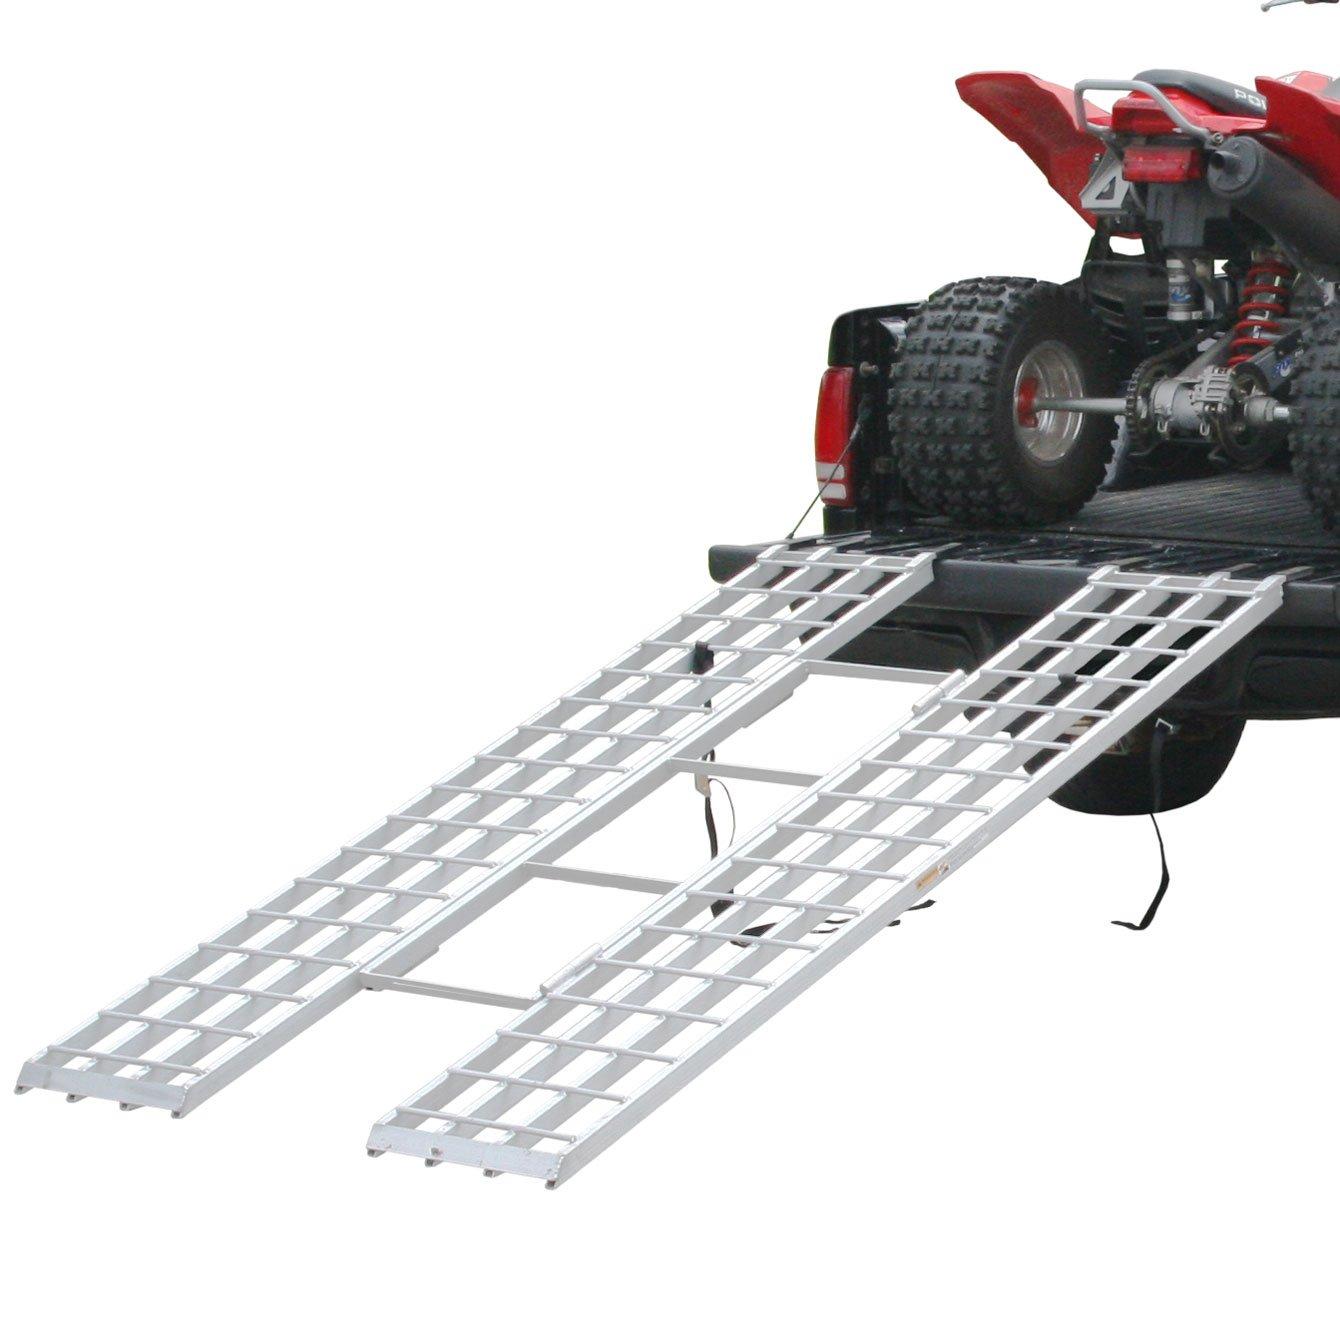 Rage Powersports ITF-8546 Loading Ramp (85' x 46' Tri-Fold ATV for 4x4 Raised Trucks)